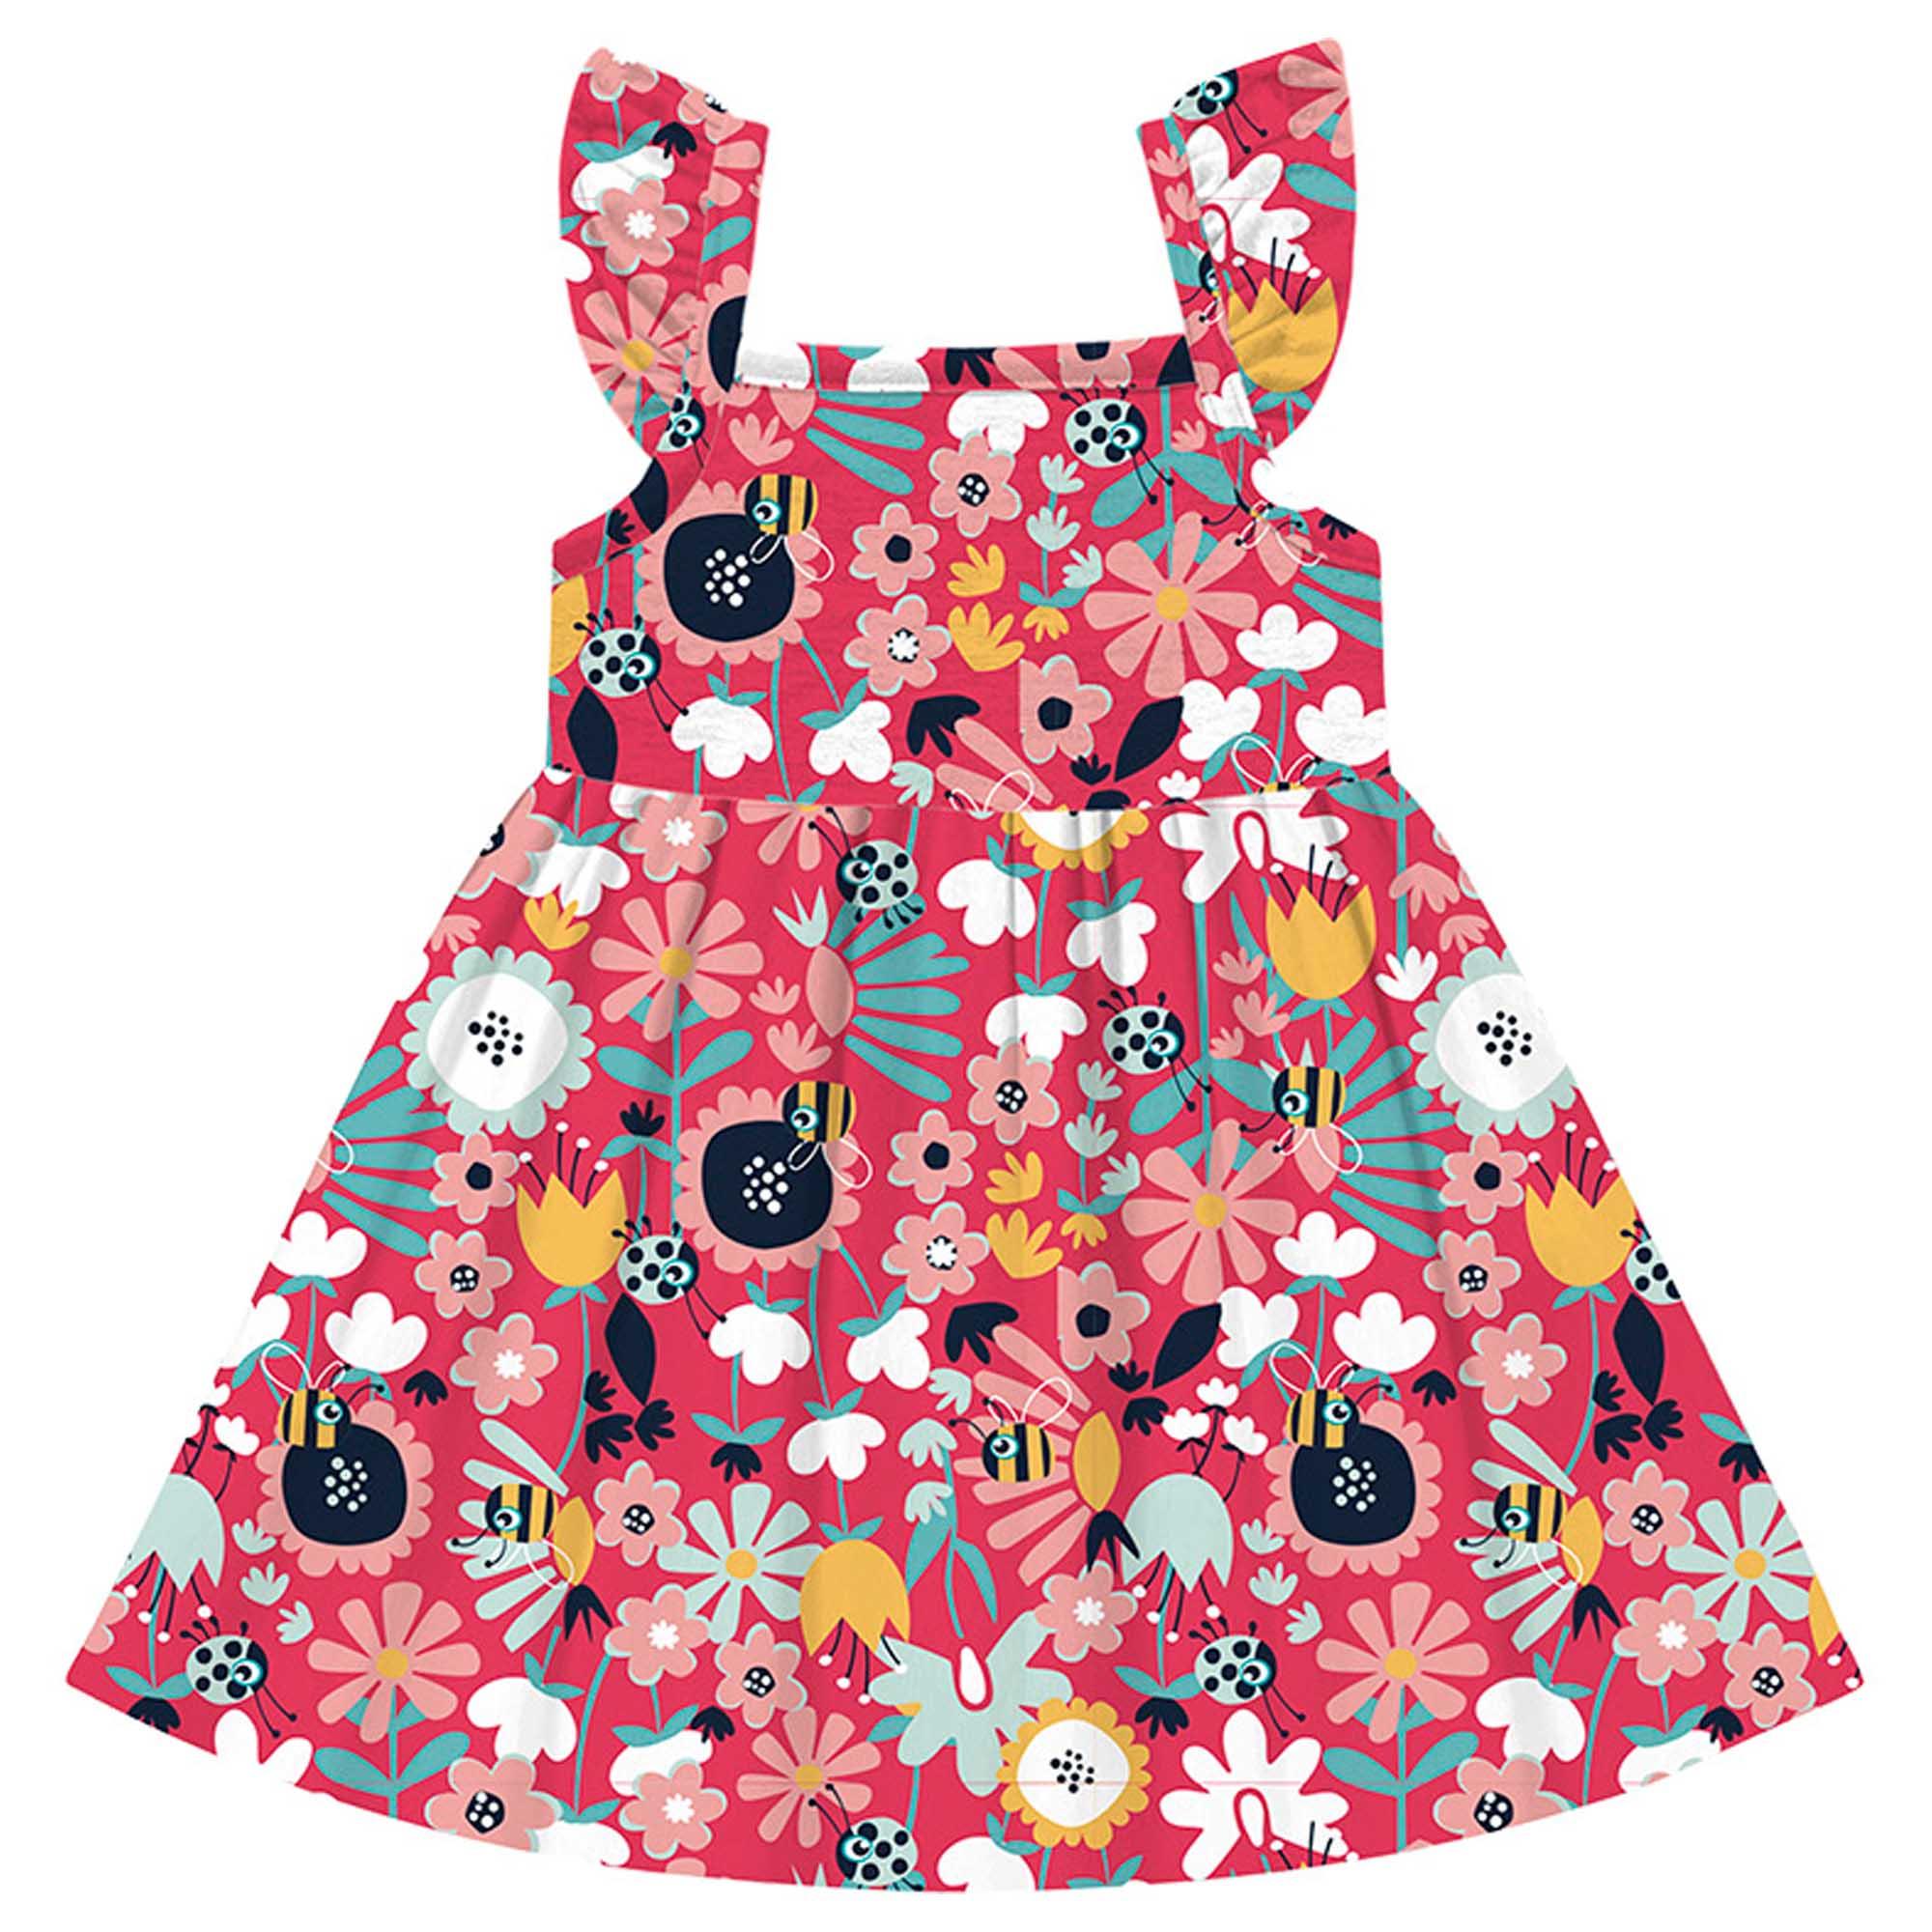 Vestido Verão Kiko e Kika - Florido - 1 ao 3